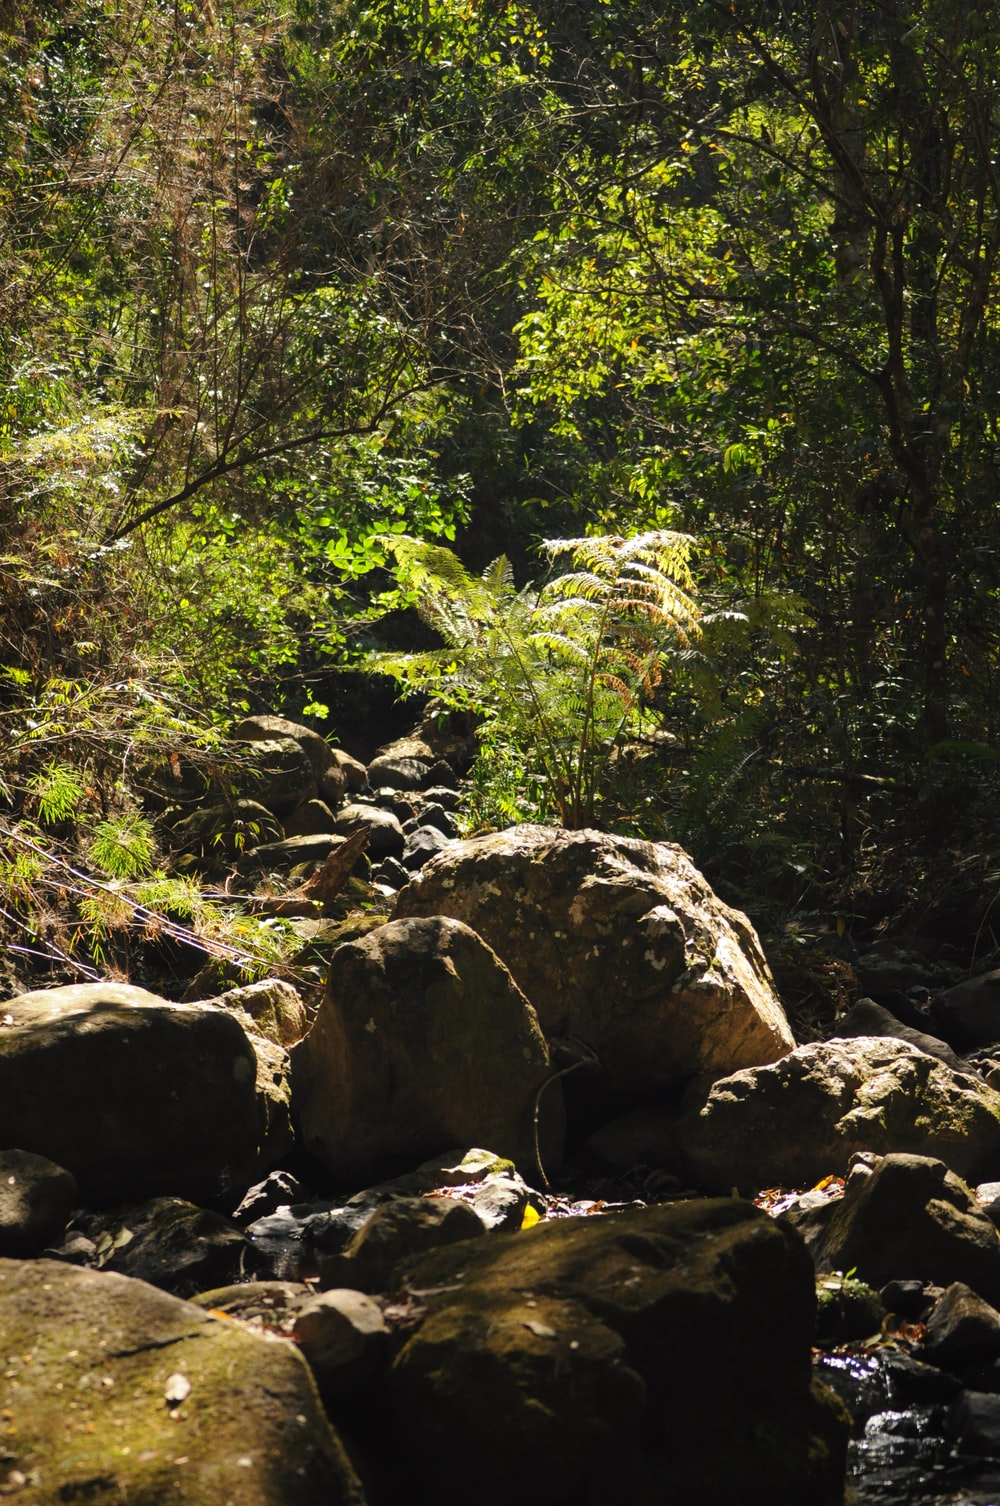 gray rocks near green trees during daytime